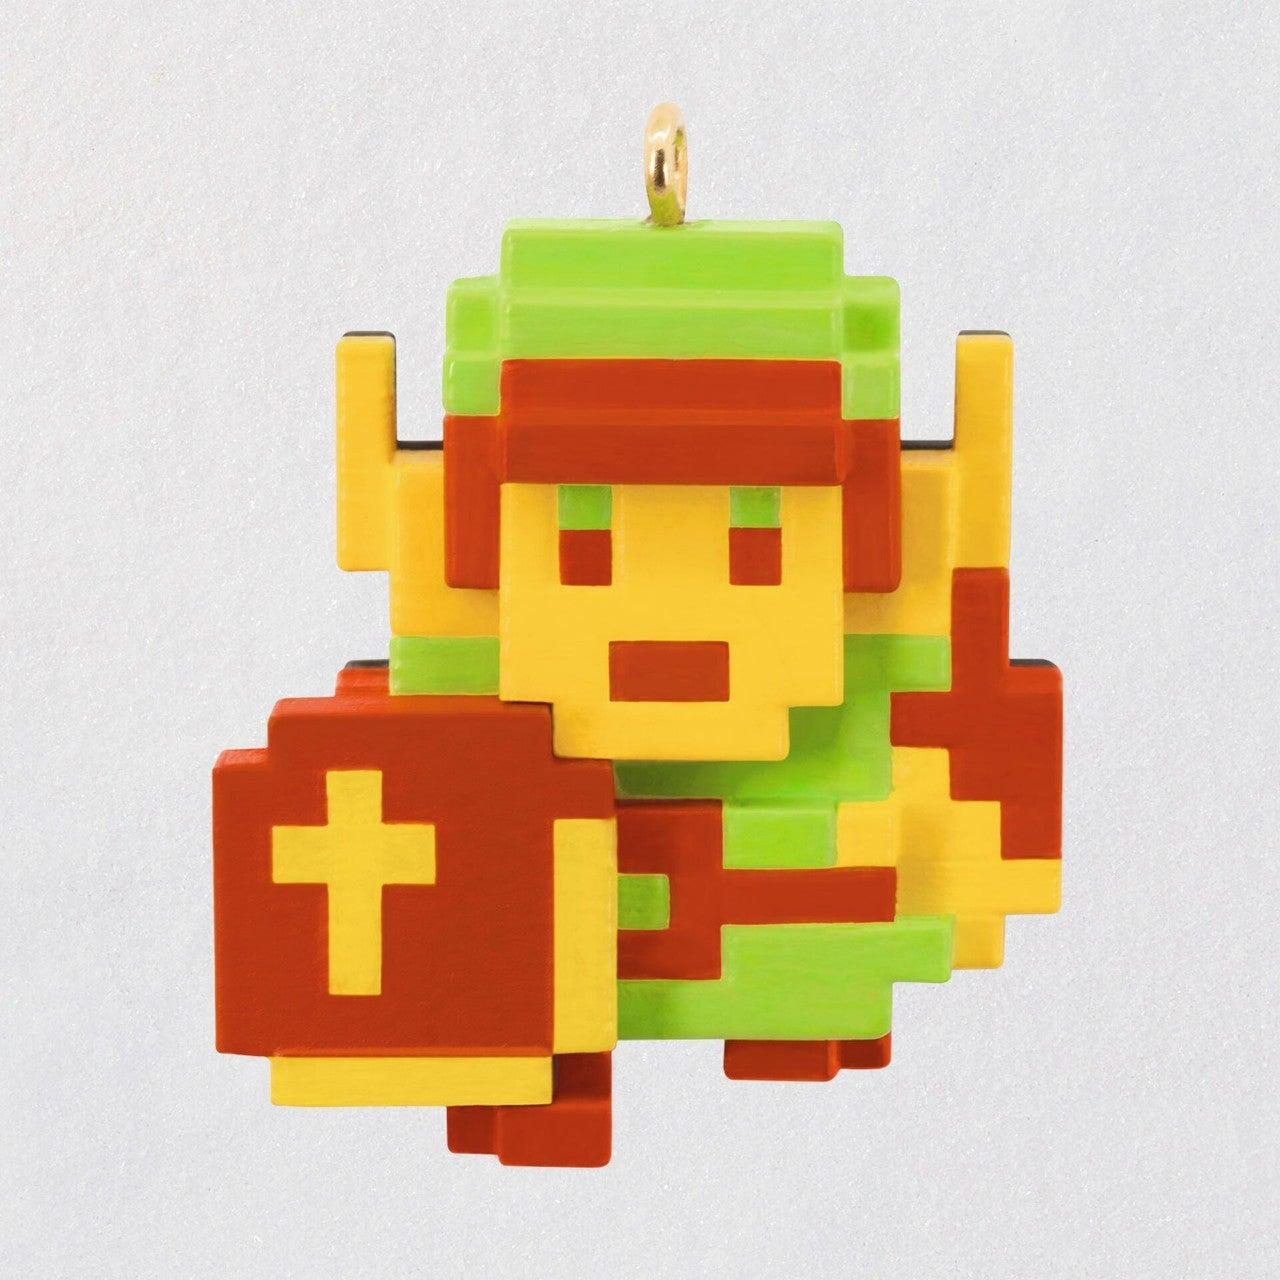 Mini-Nintendo-The-Legend-of-Zelda-Link-Keepsake-Ornament_899QXM8335_01